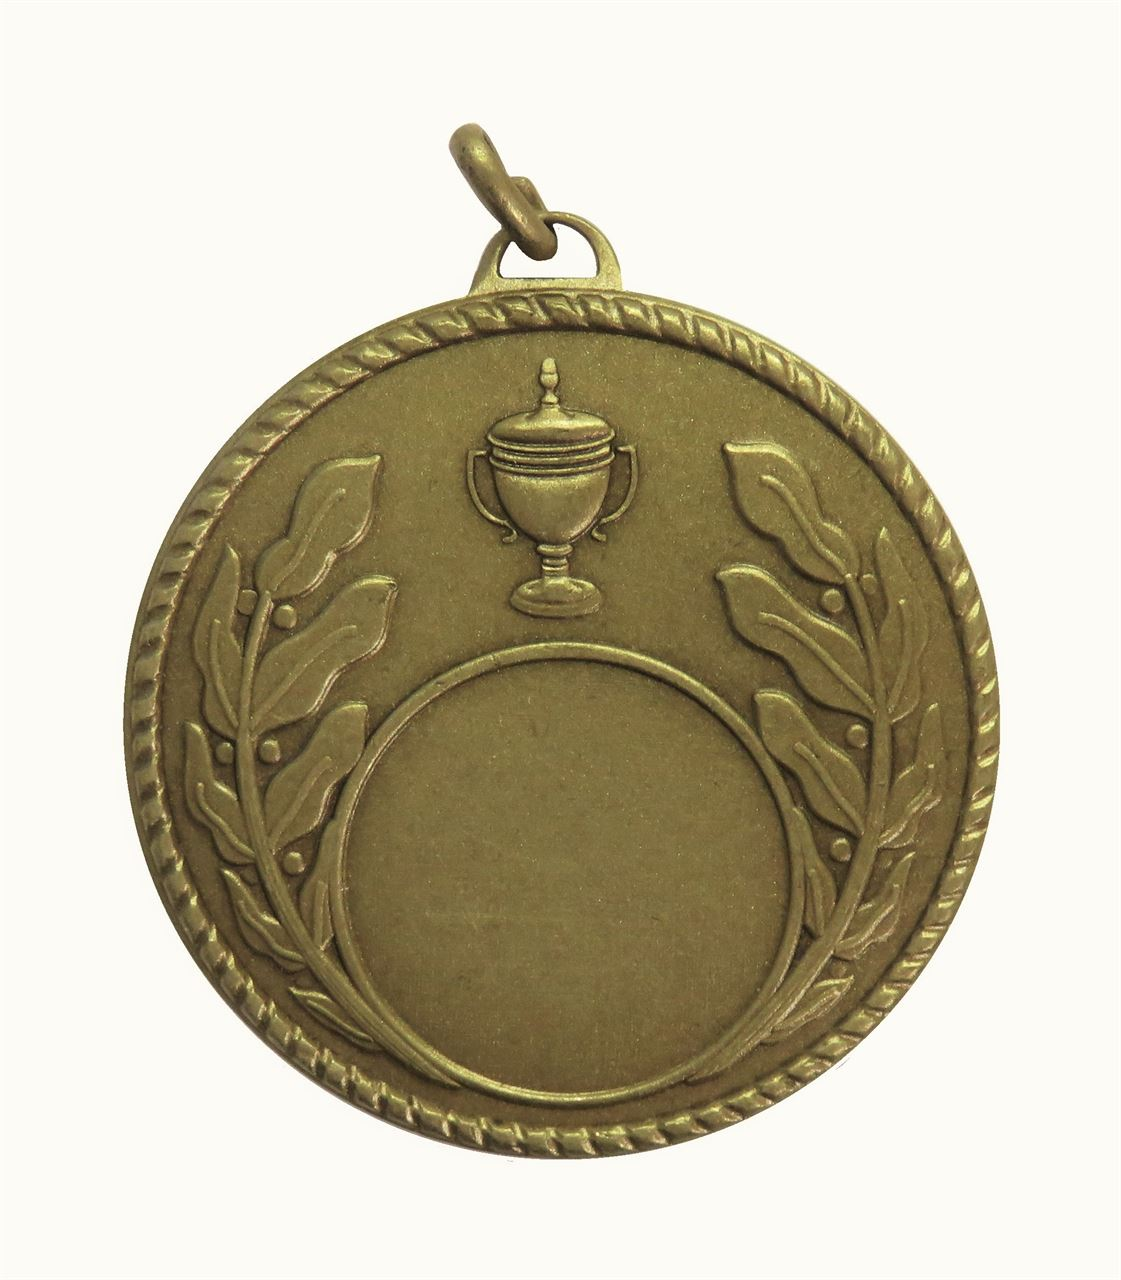 Bronze Quality Laurel & Cup Medal (size: 50mm) - 5804E